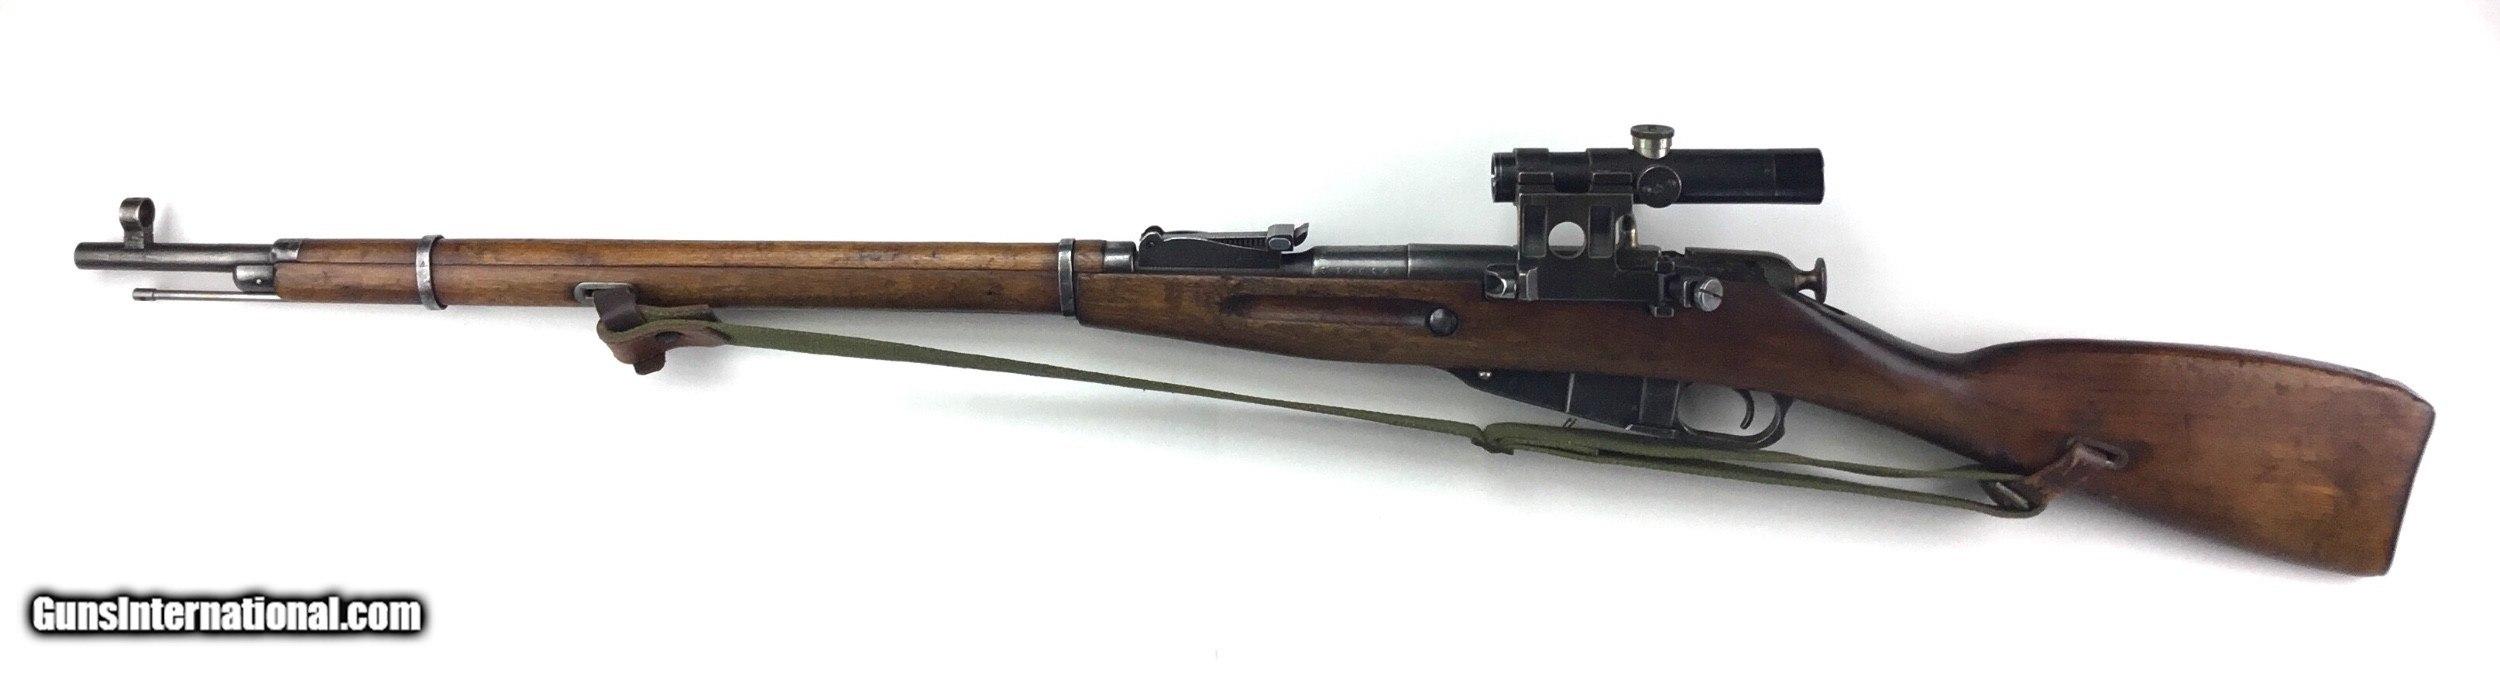 "Mosin-Nagant 91/30 7 62x54R 29"" Bbl"